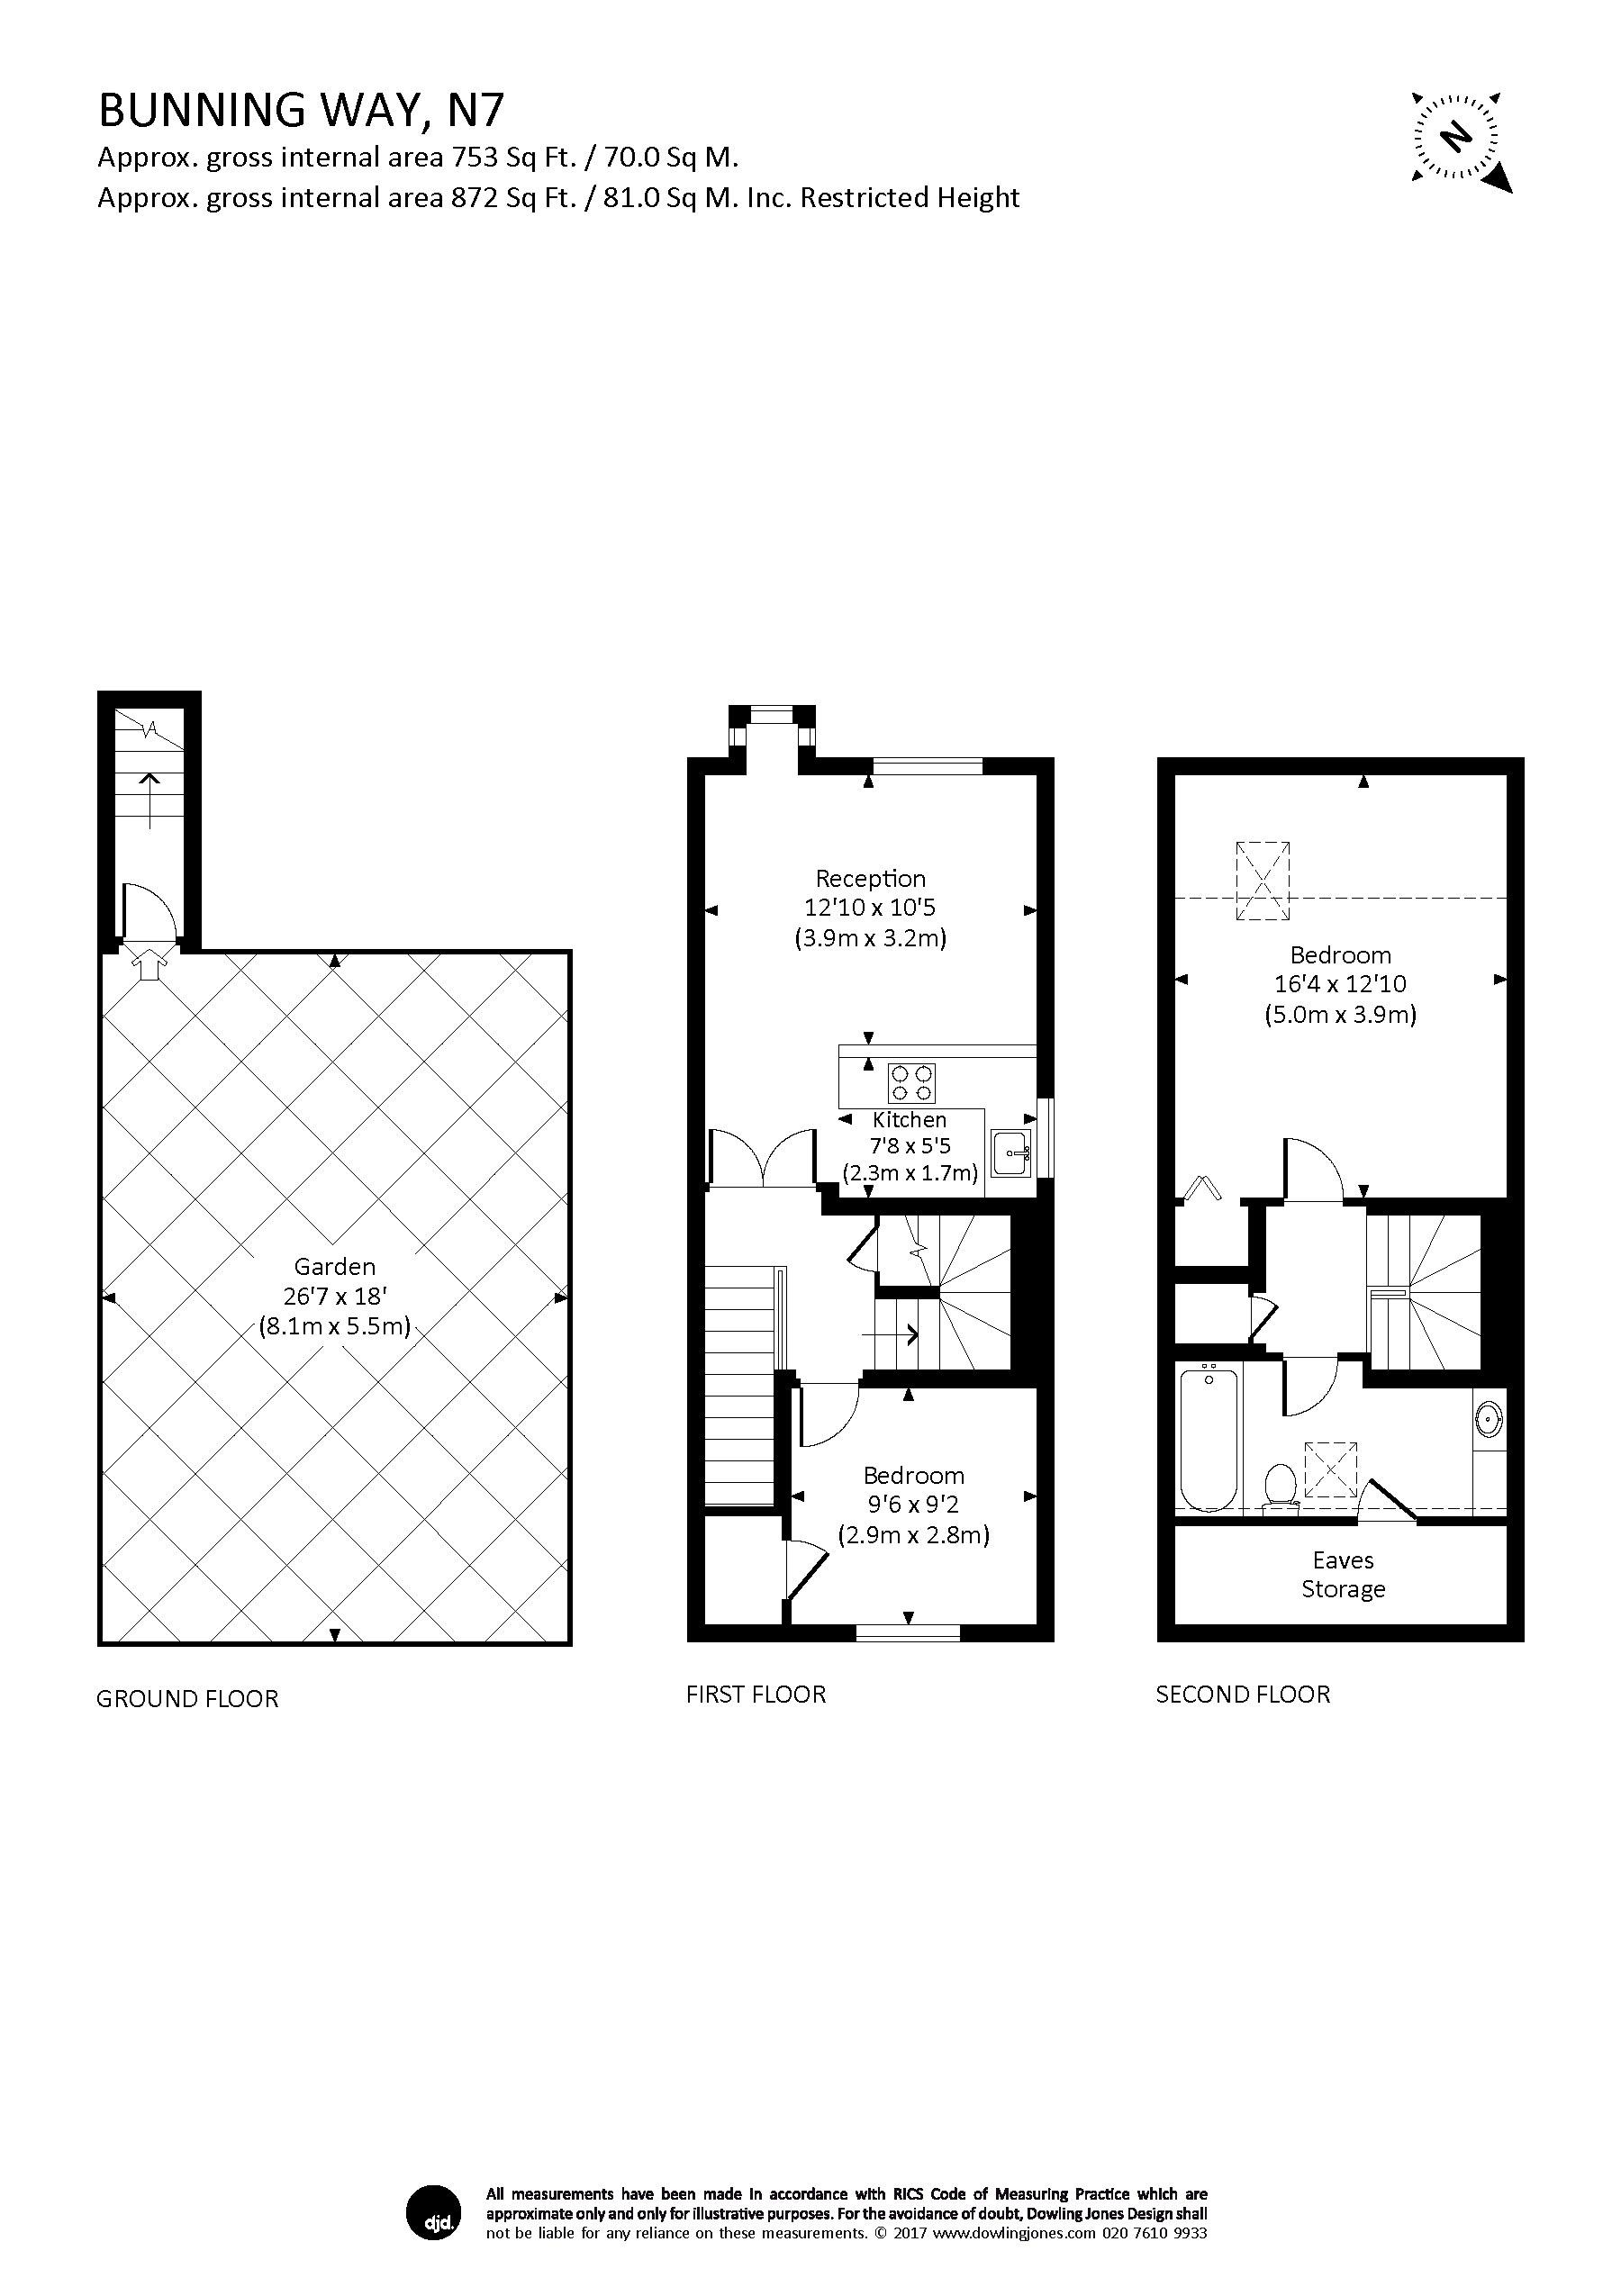 Bunning way london n7 2 bedroom flat to rent 44860628 for Azeri cuisine caledonian road